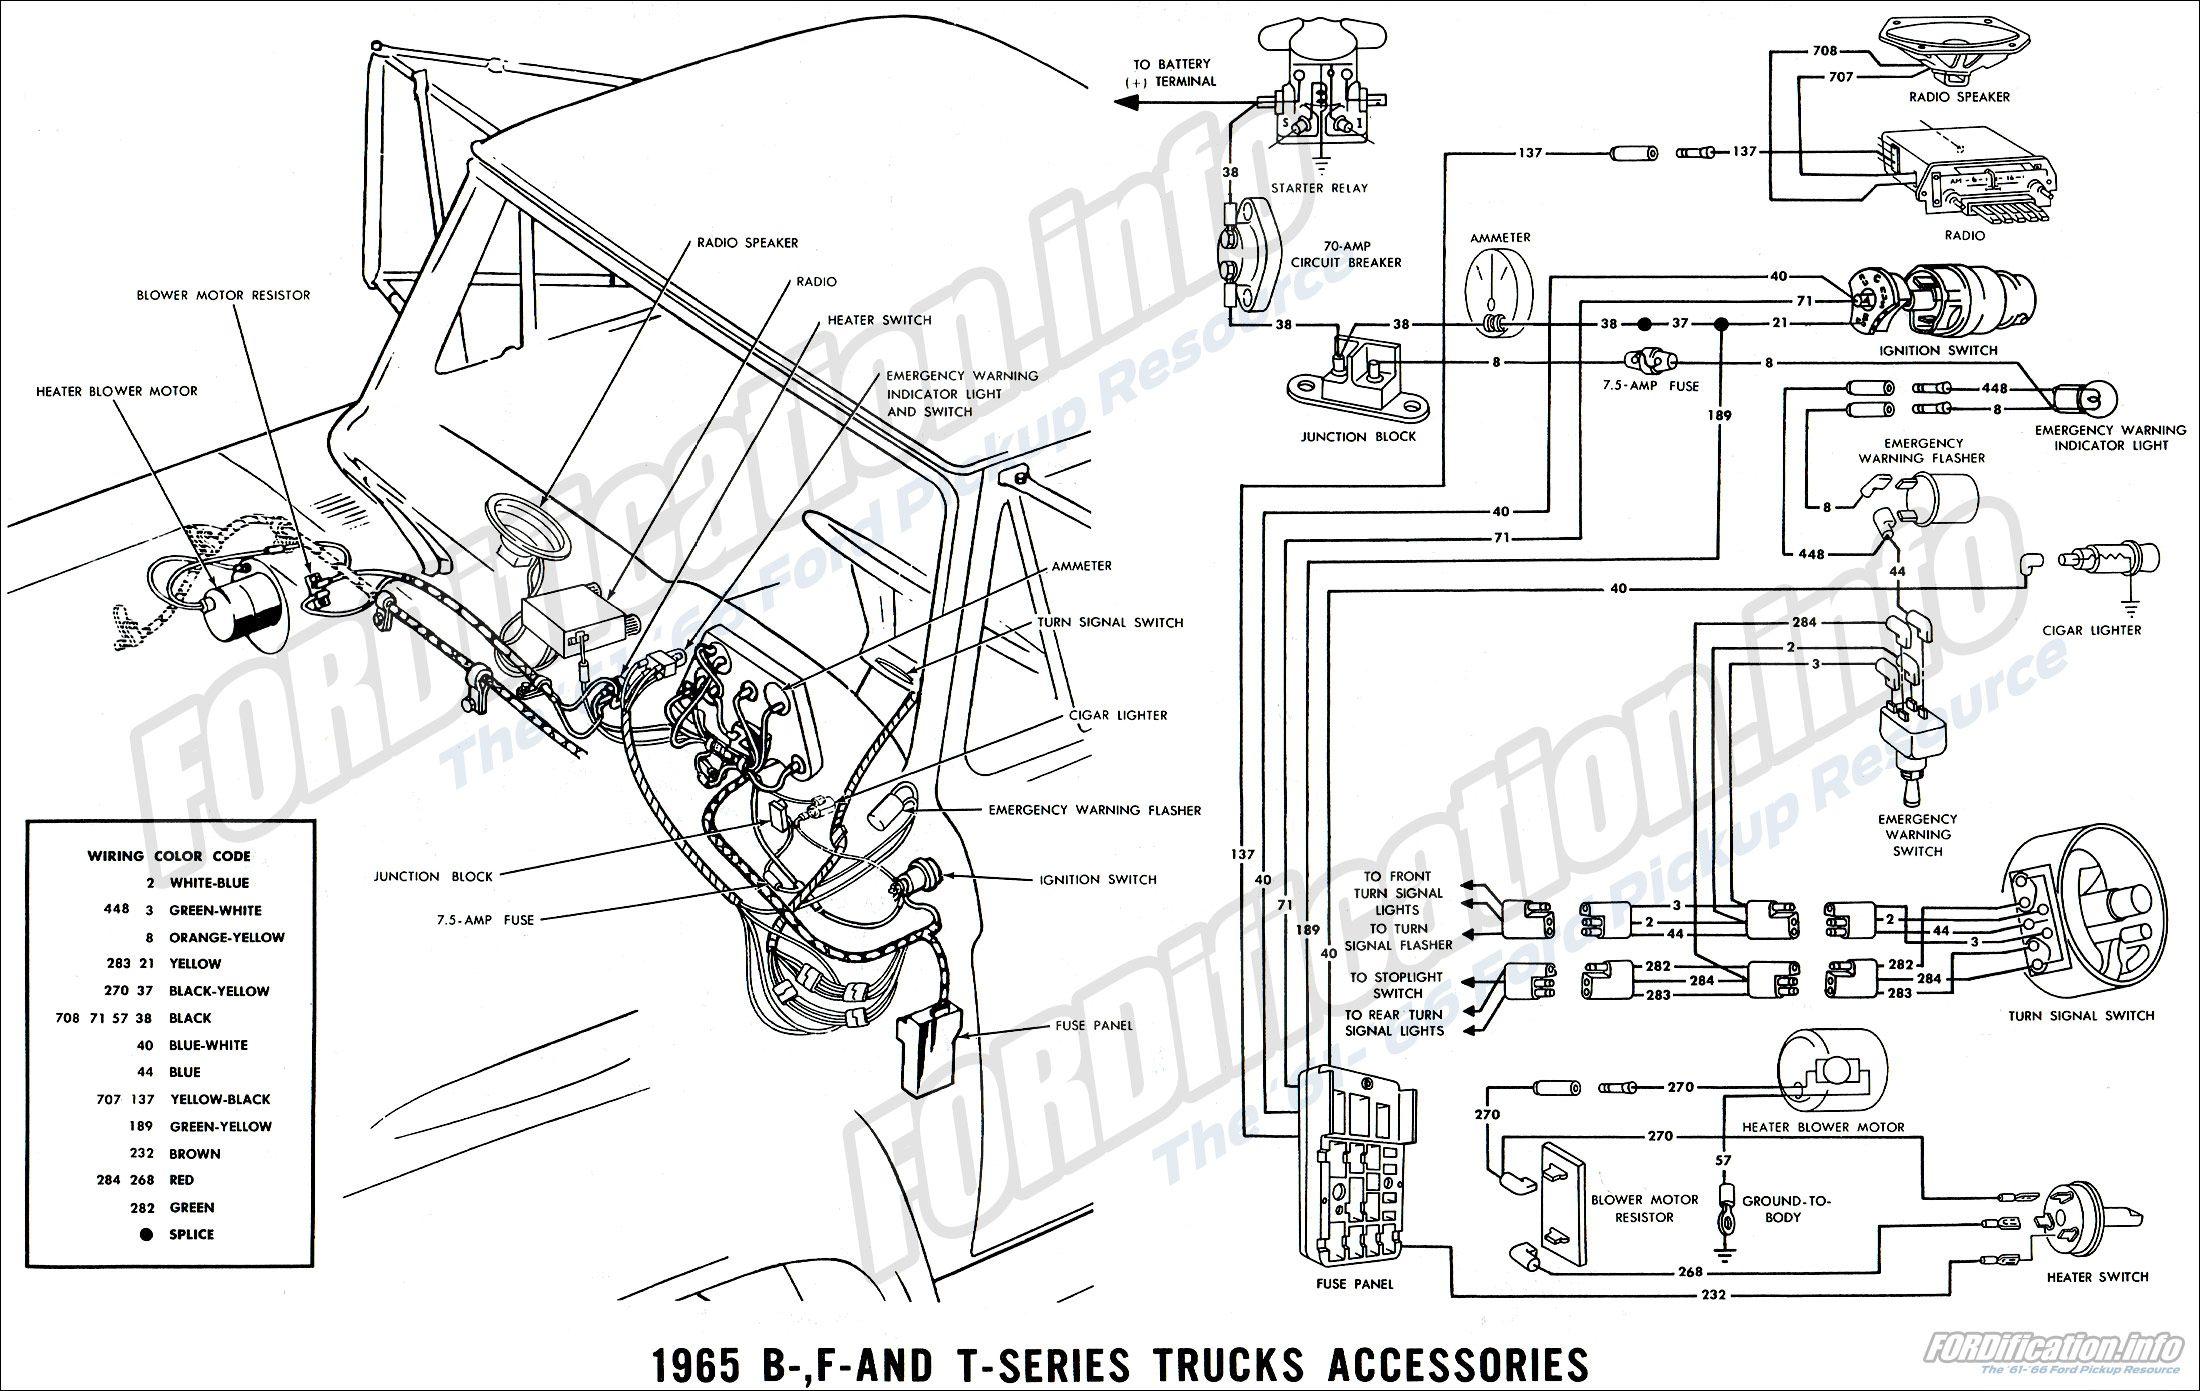 Pin By Samantha Unverferth Urban On 65 F100 Diagram Floor Plans Art